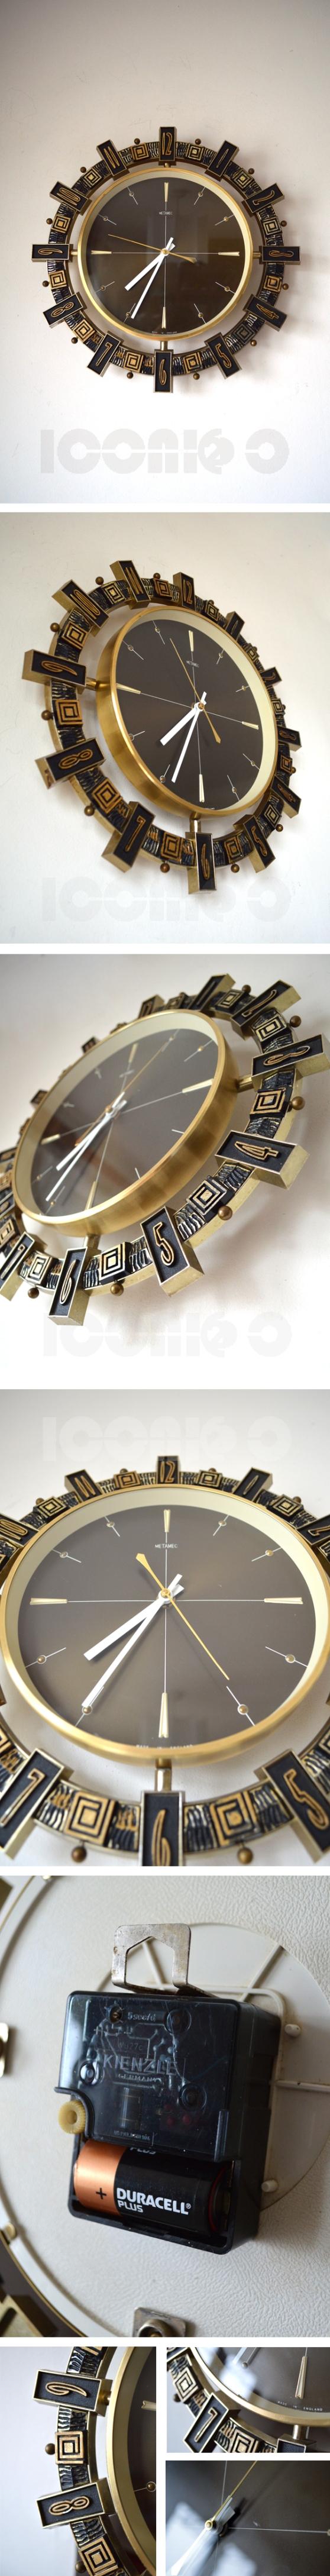 metamec-aztec-brown-face-wall-clock